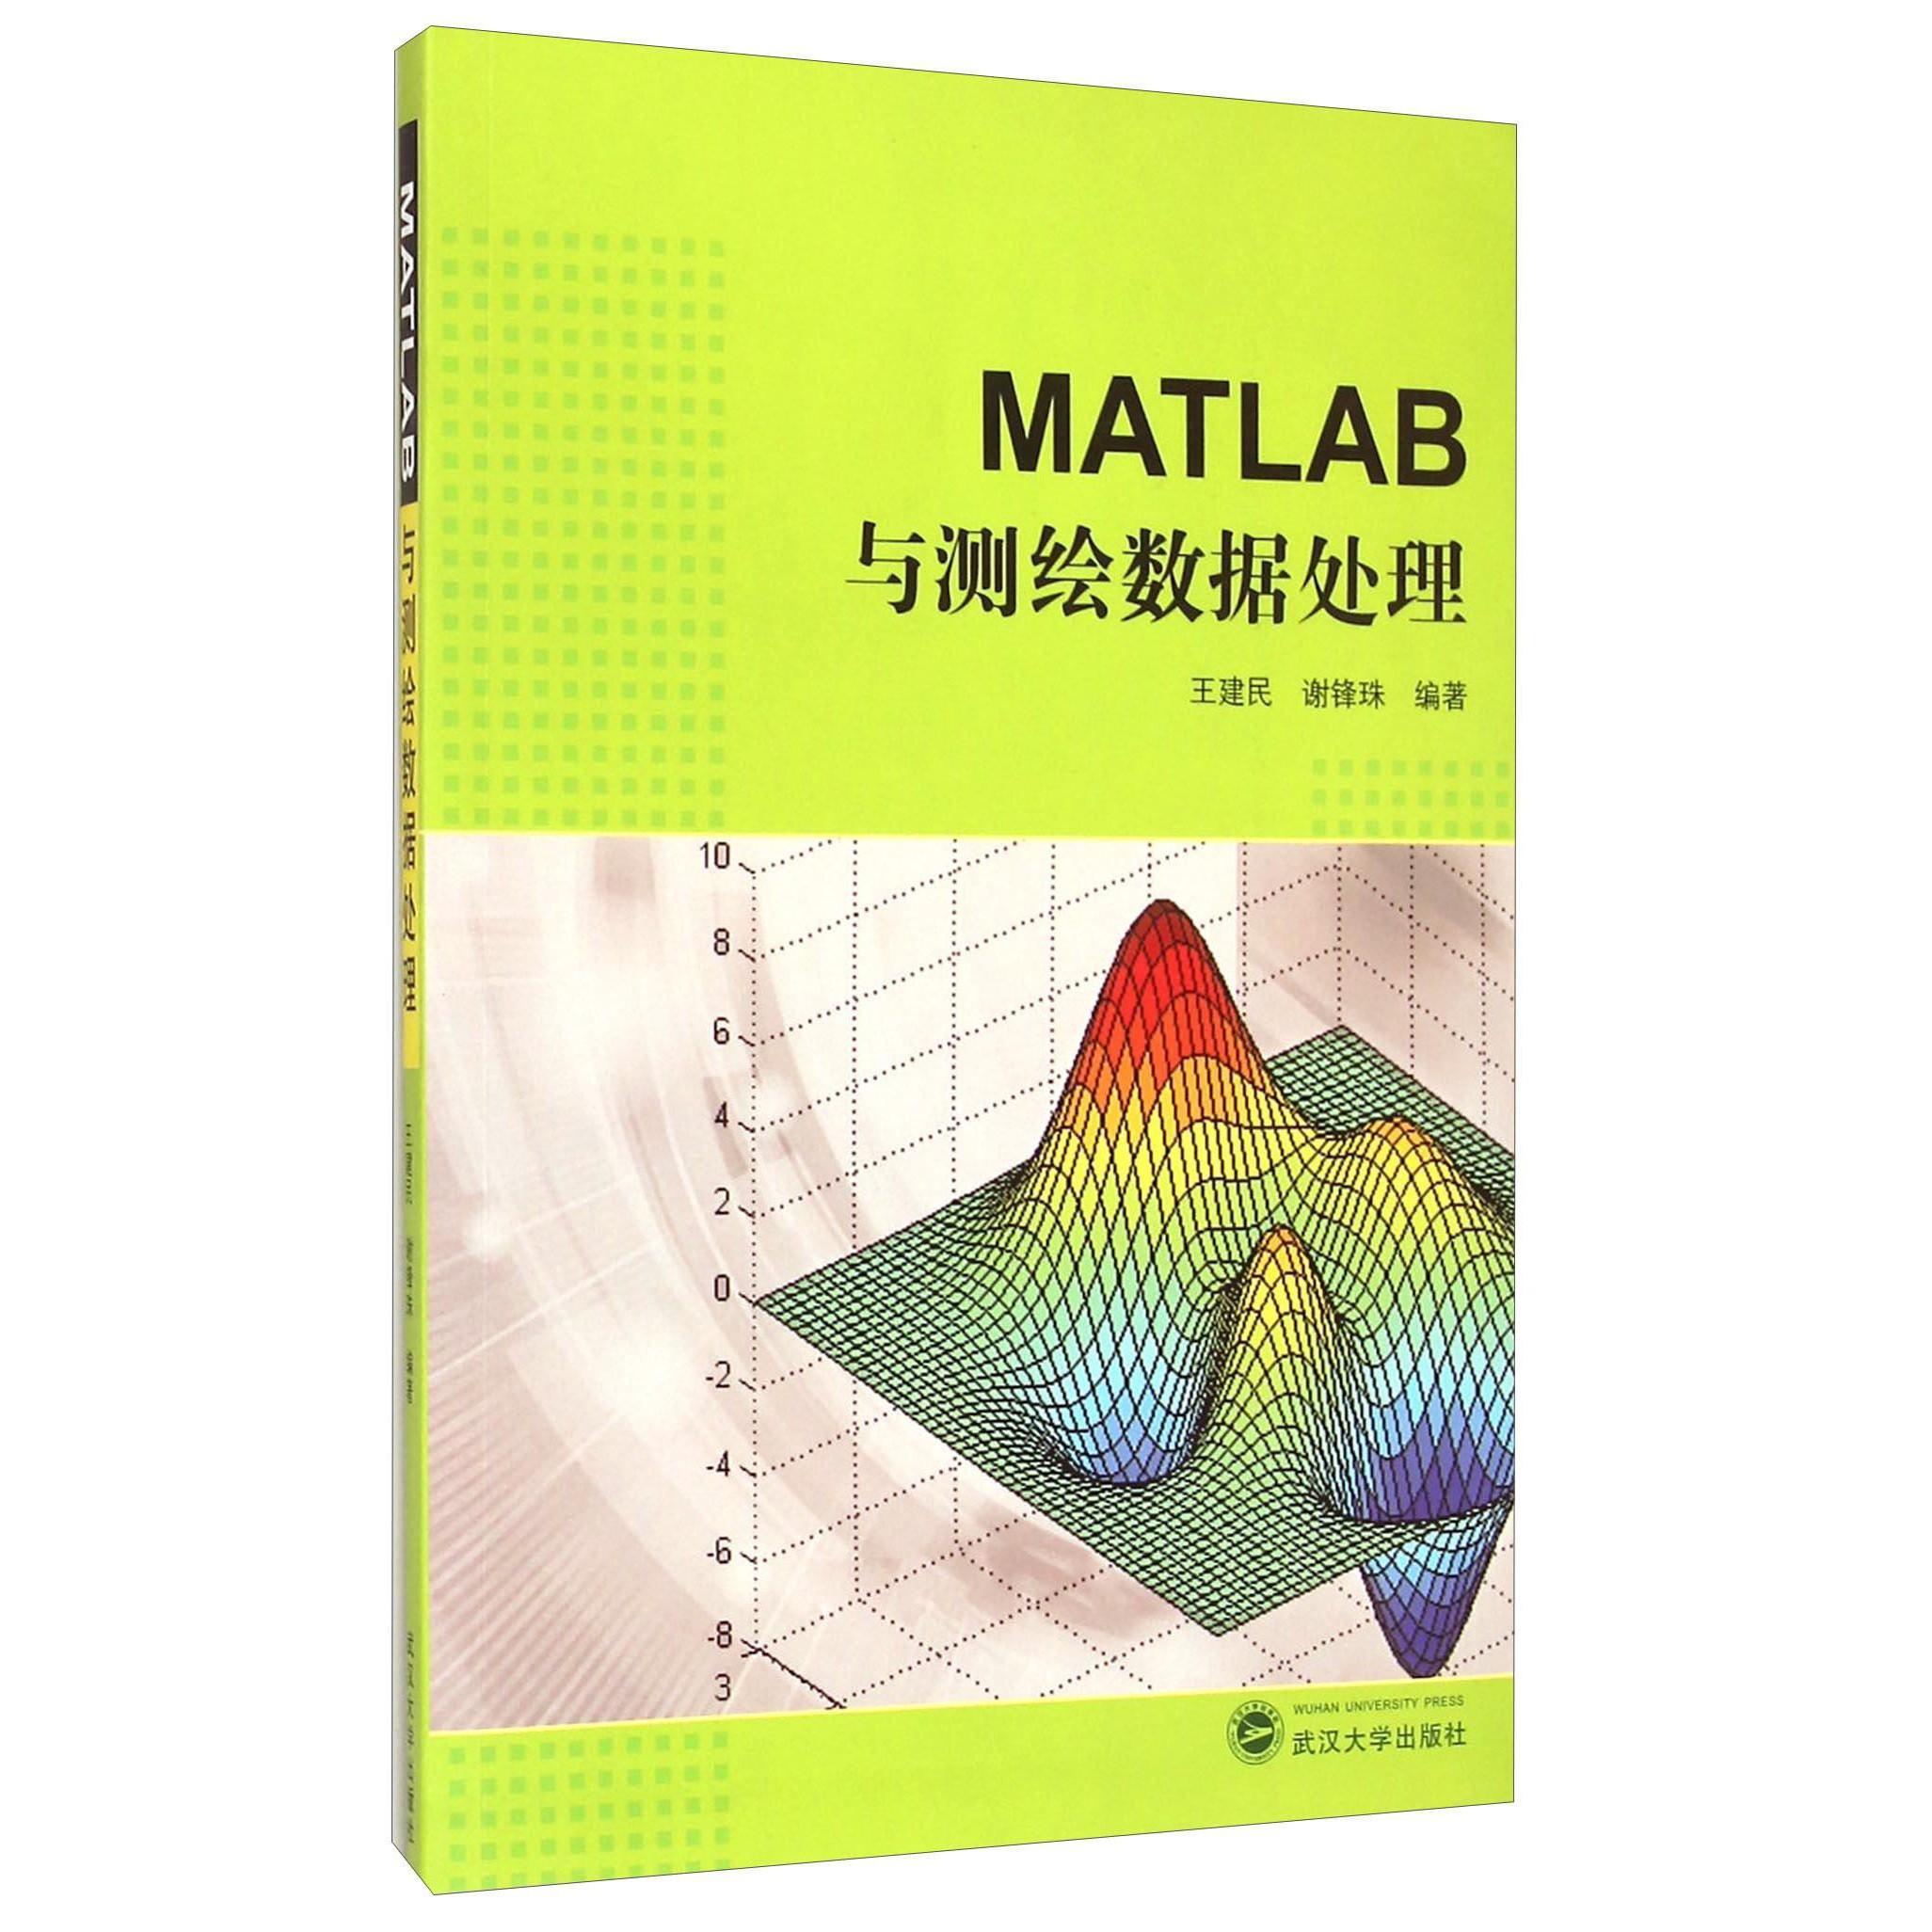 MATLAB与测绘数据处理 怎么样 - 亚米网